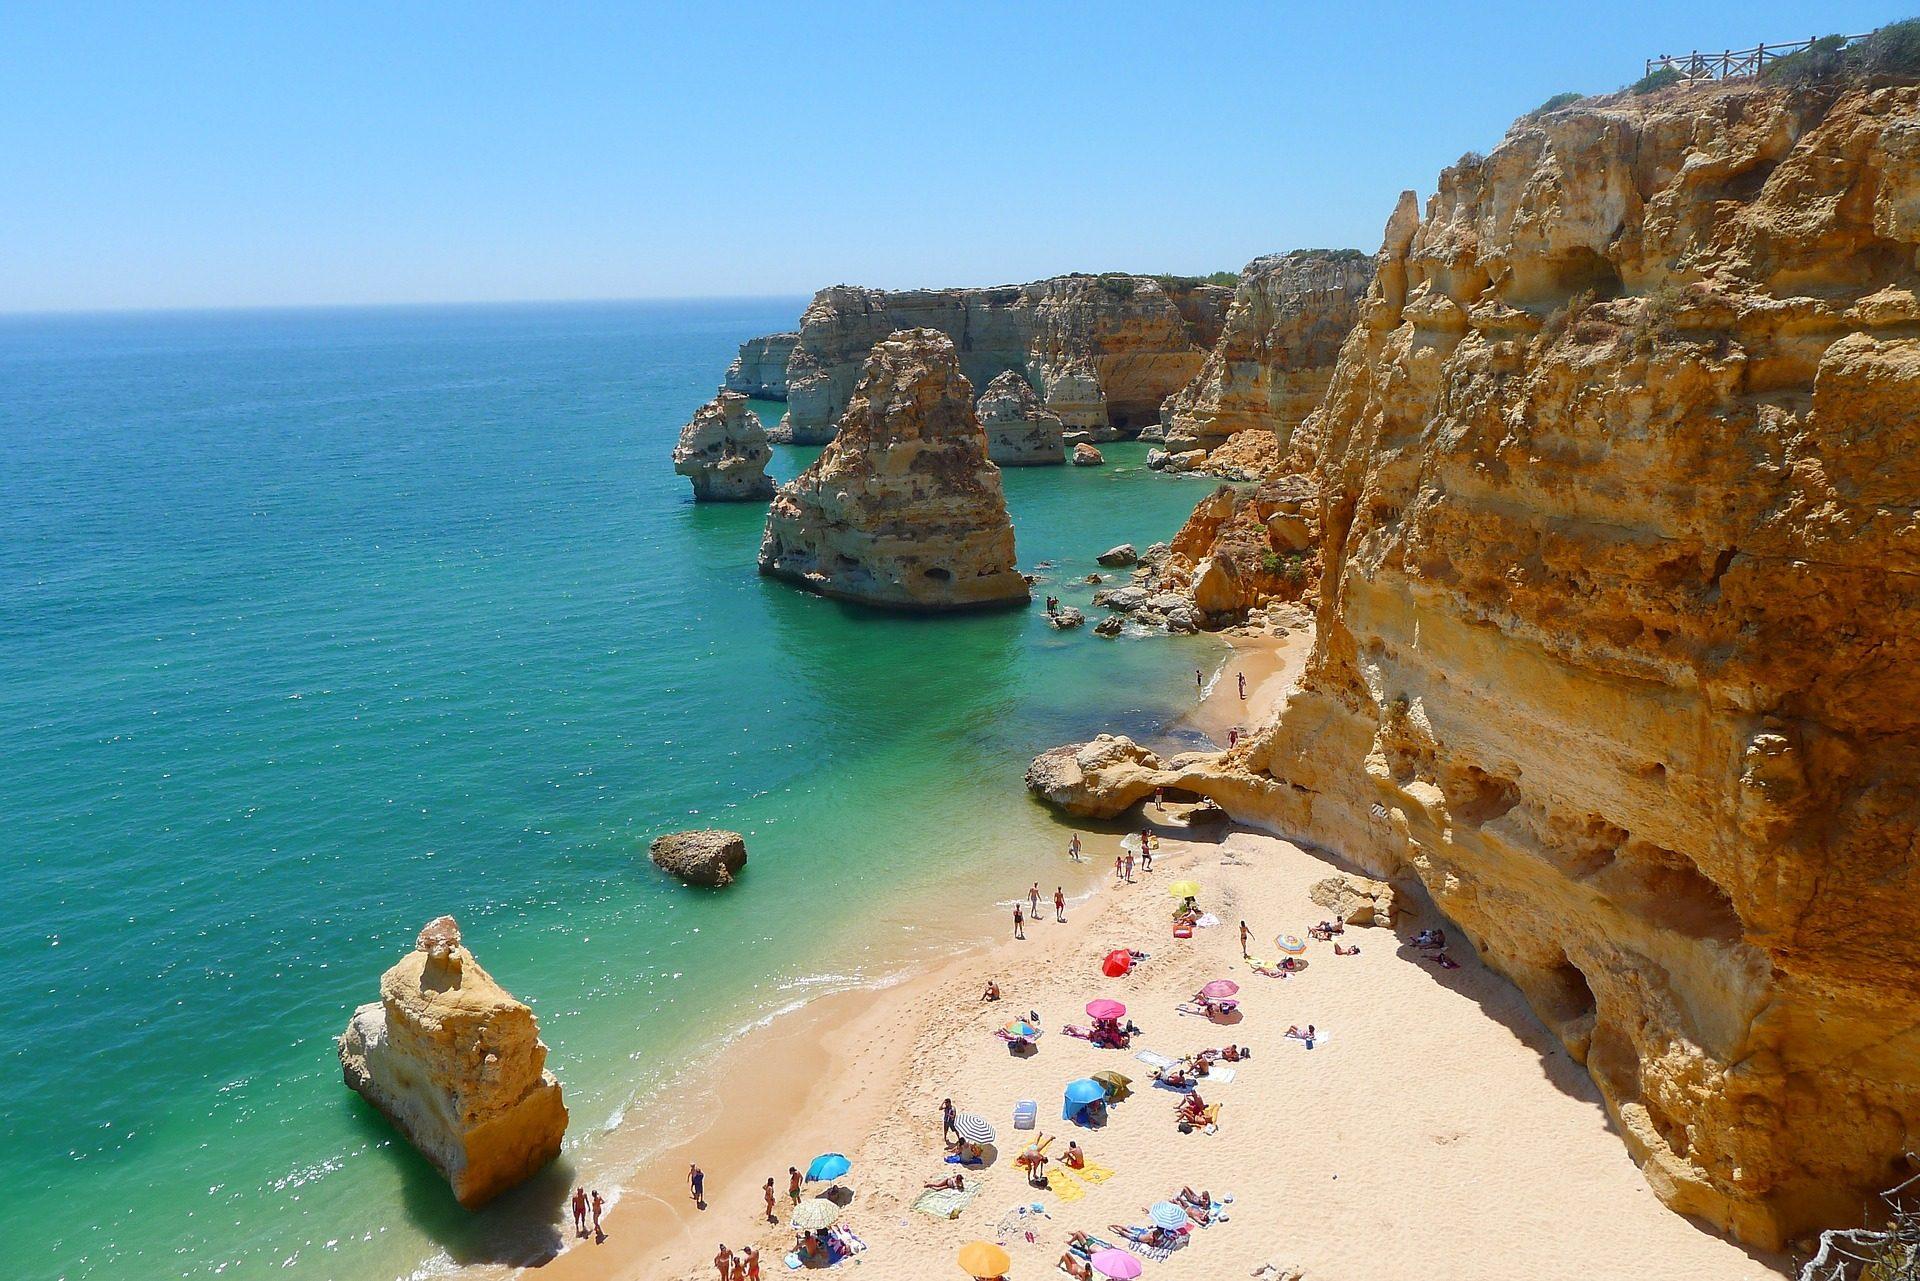 Kurzurlaub in Portugal ab 114,00€ - 4 Nächte Algarve 1